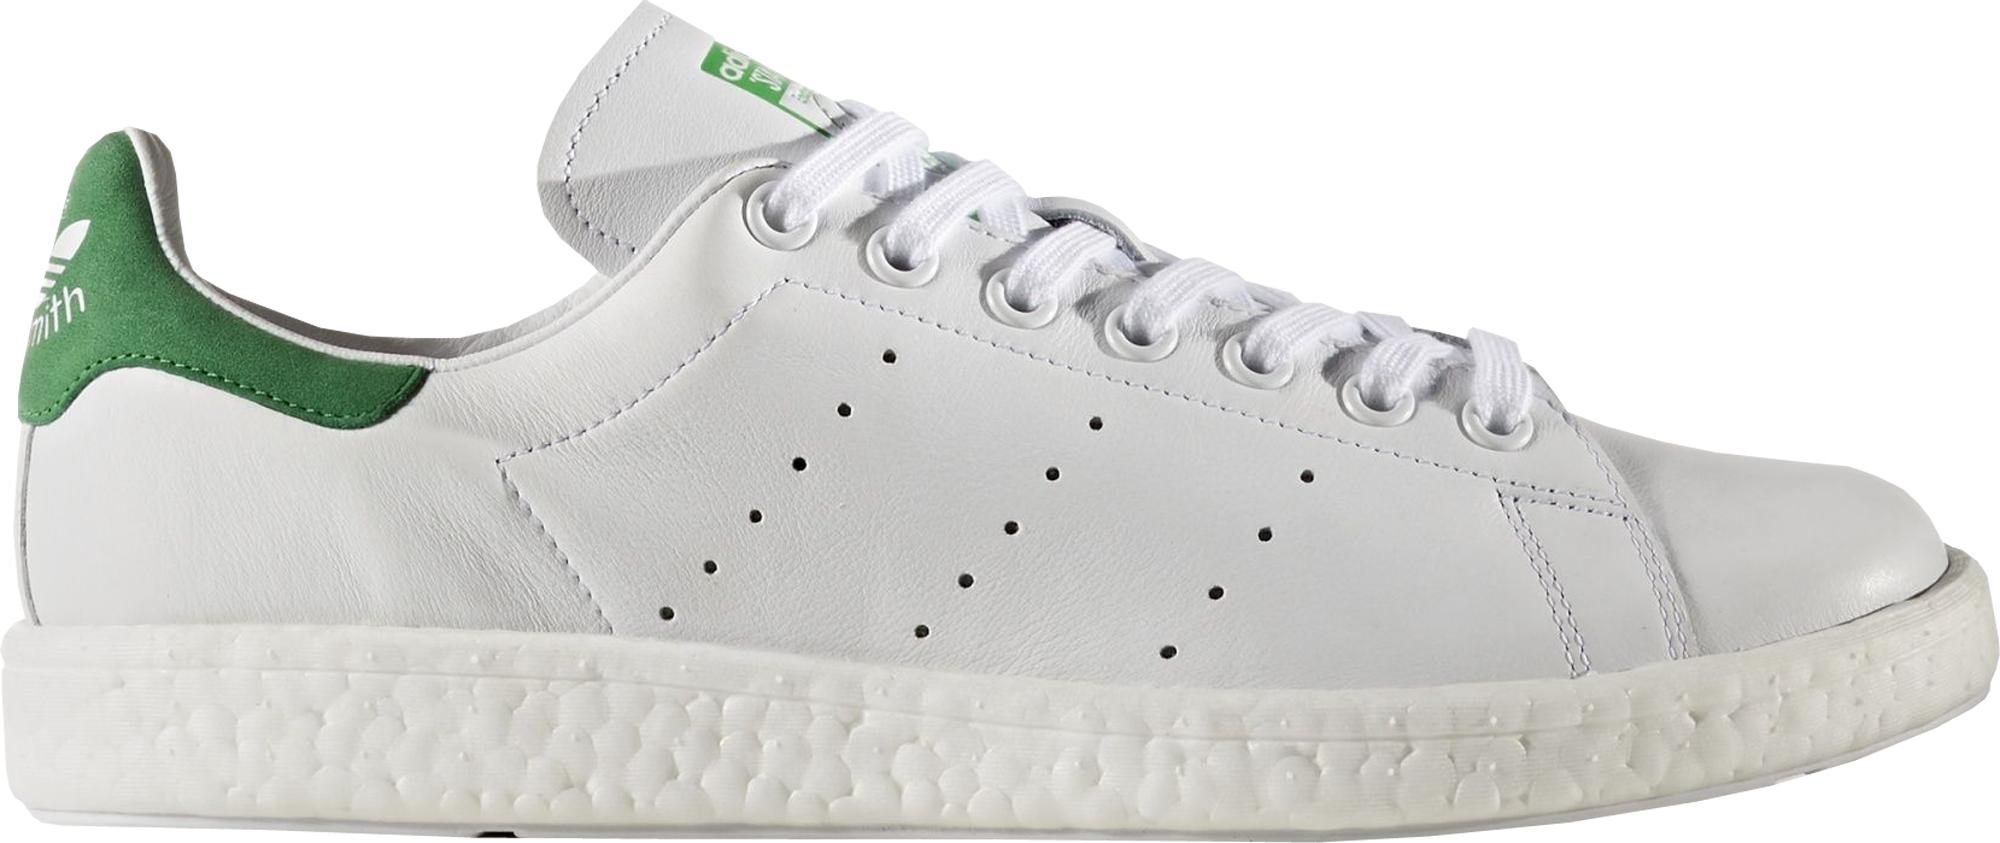 Adidas stan smith impulso bianco verde bb0008